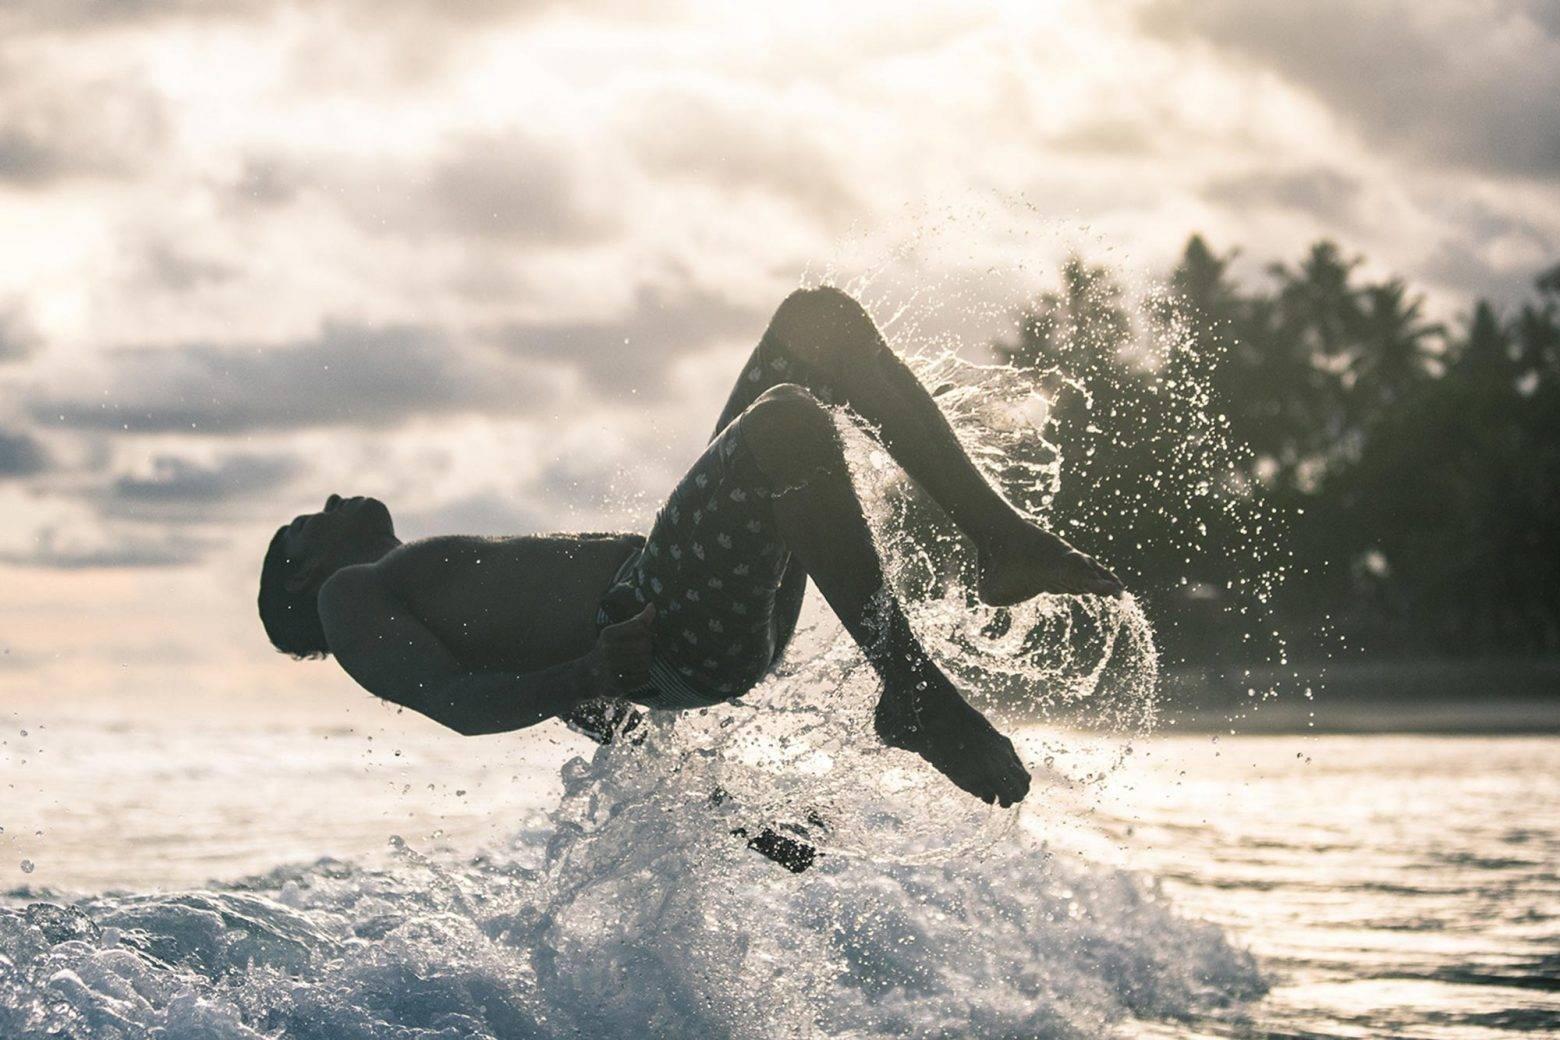 https://www.soulandsurf.com/wp-content/uploads/2021/07/lanka-surf-JUMP-1-e1627738626302.jpeg Image